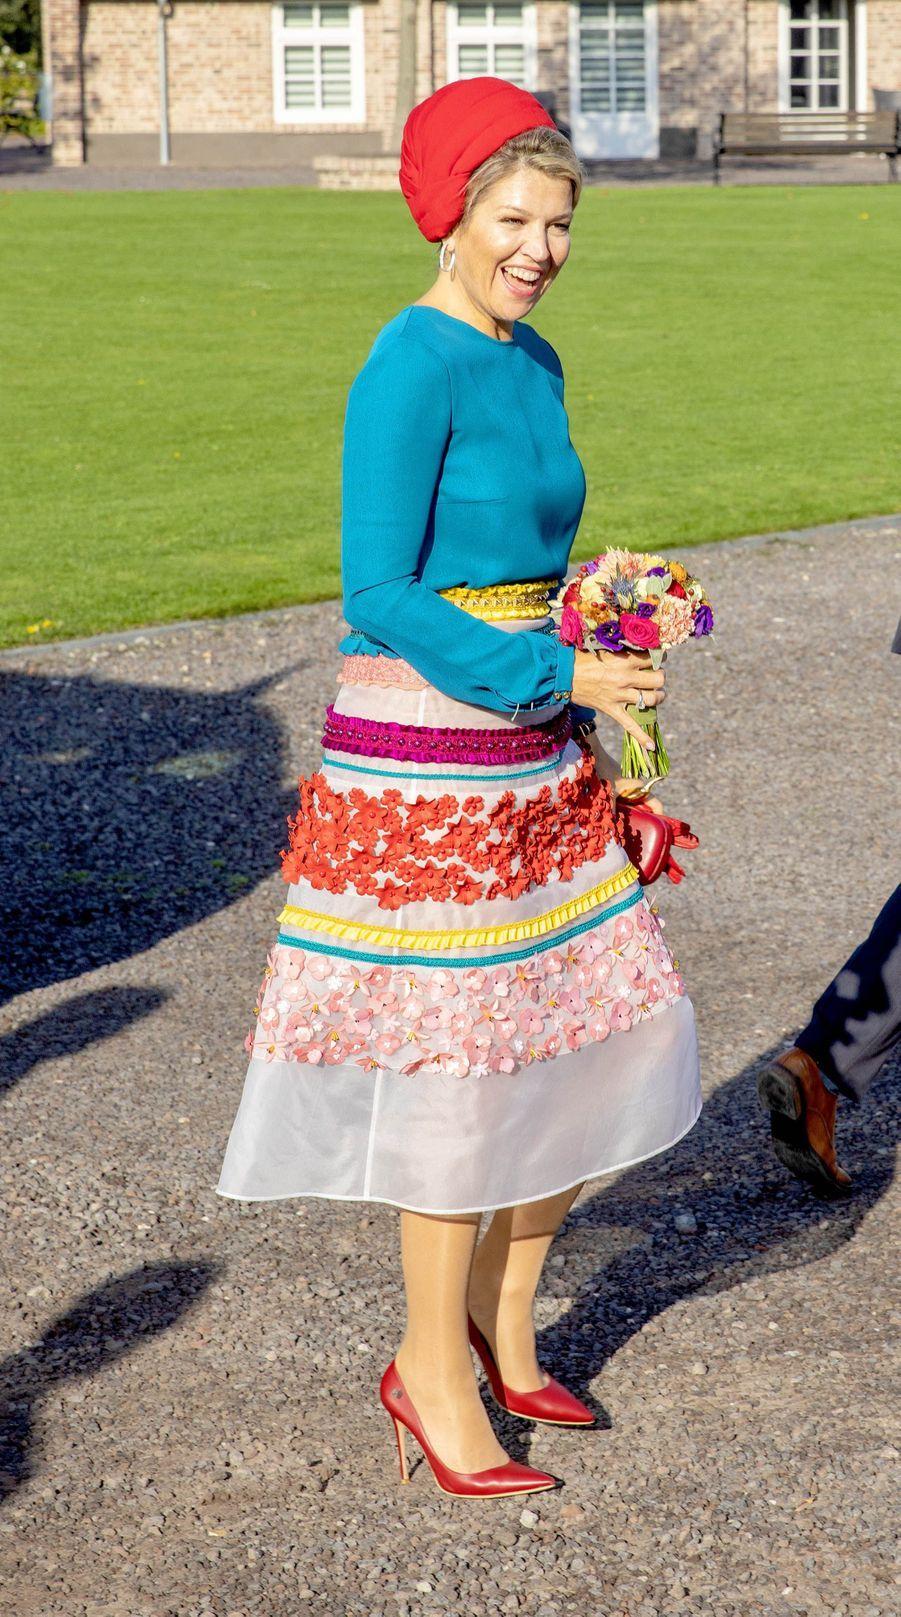 La reine Maxima des Pays-Bas, le 16 octobre 2018 en Zélande